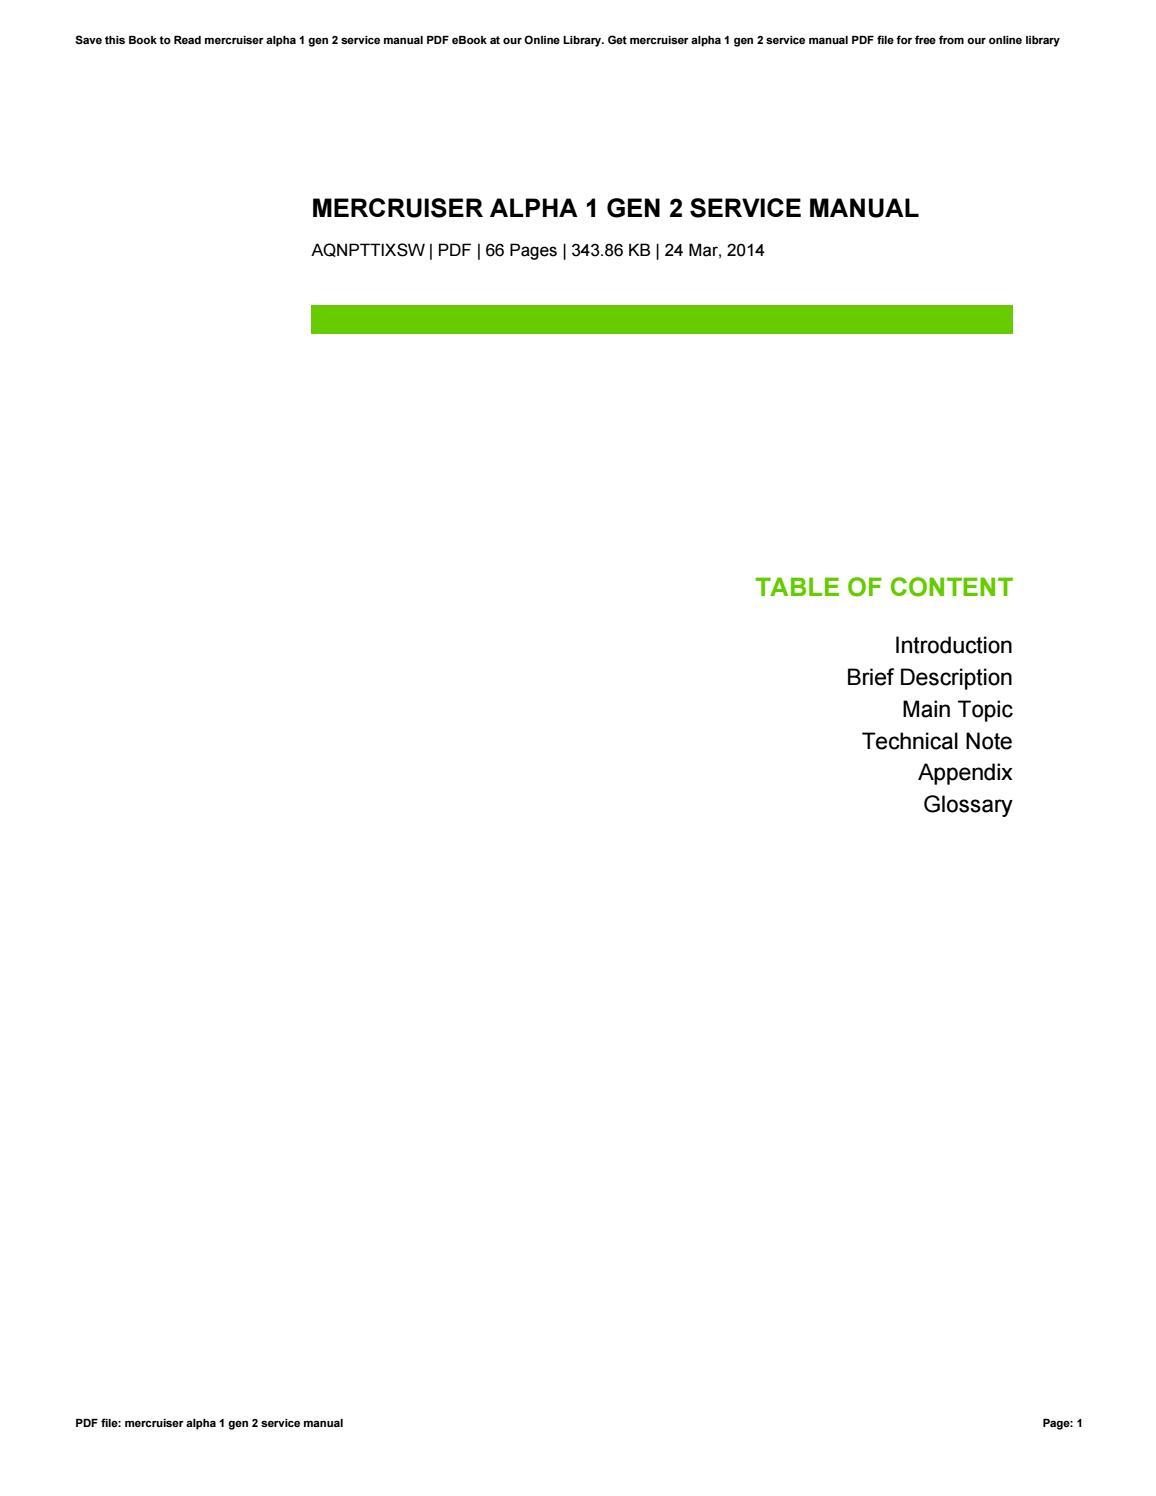 Mercruiser alpha 1 gen 2 service manual by beatricemeans4064 issuu fandeluxe Gallery